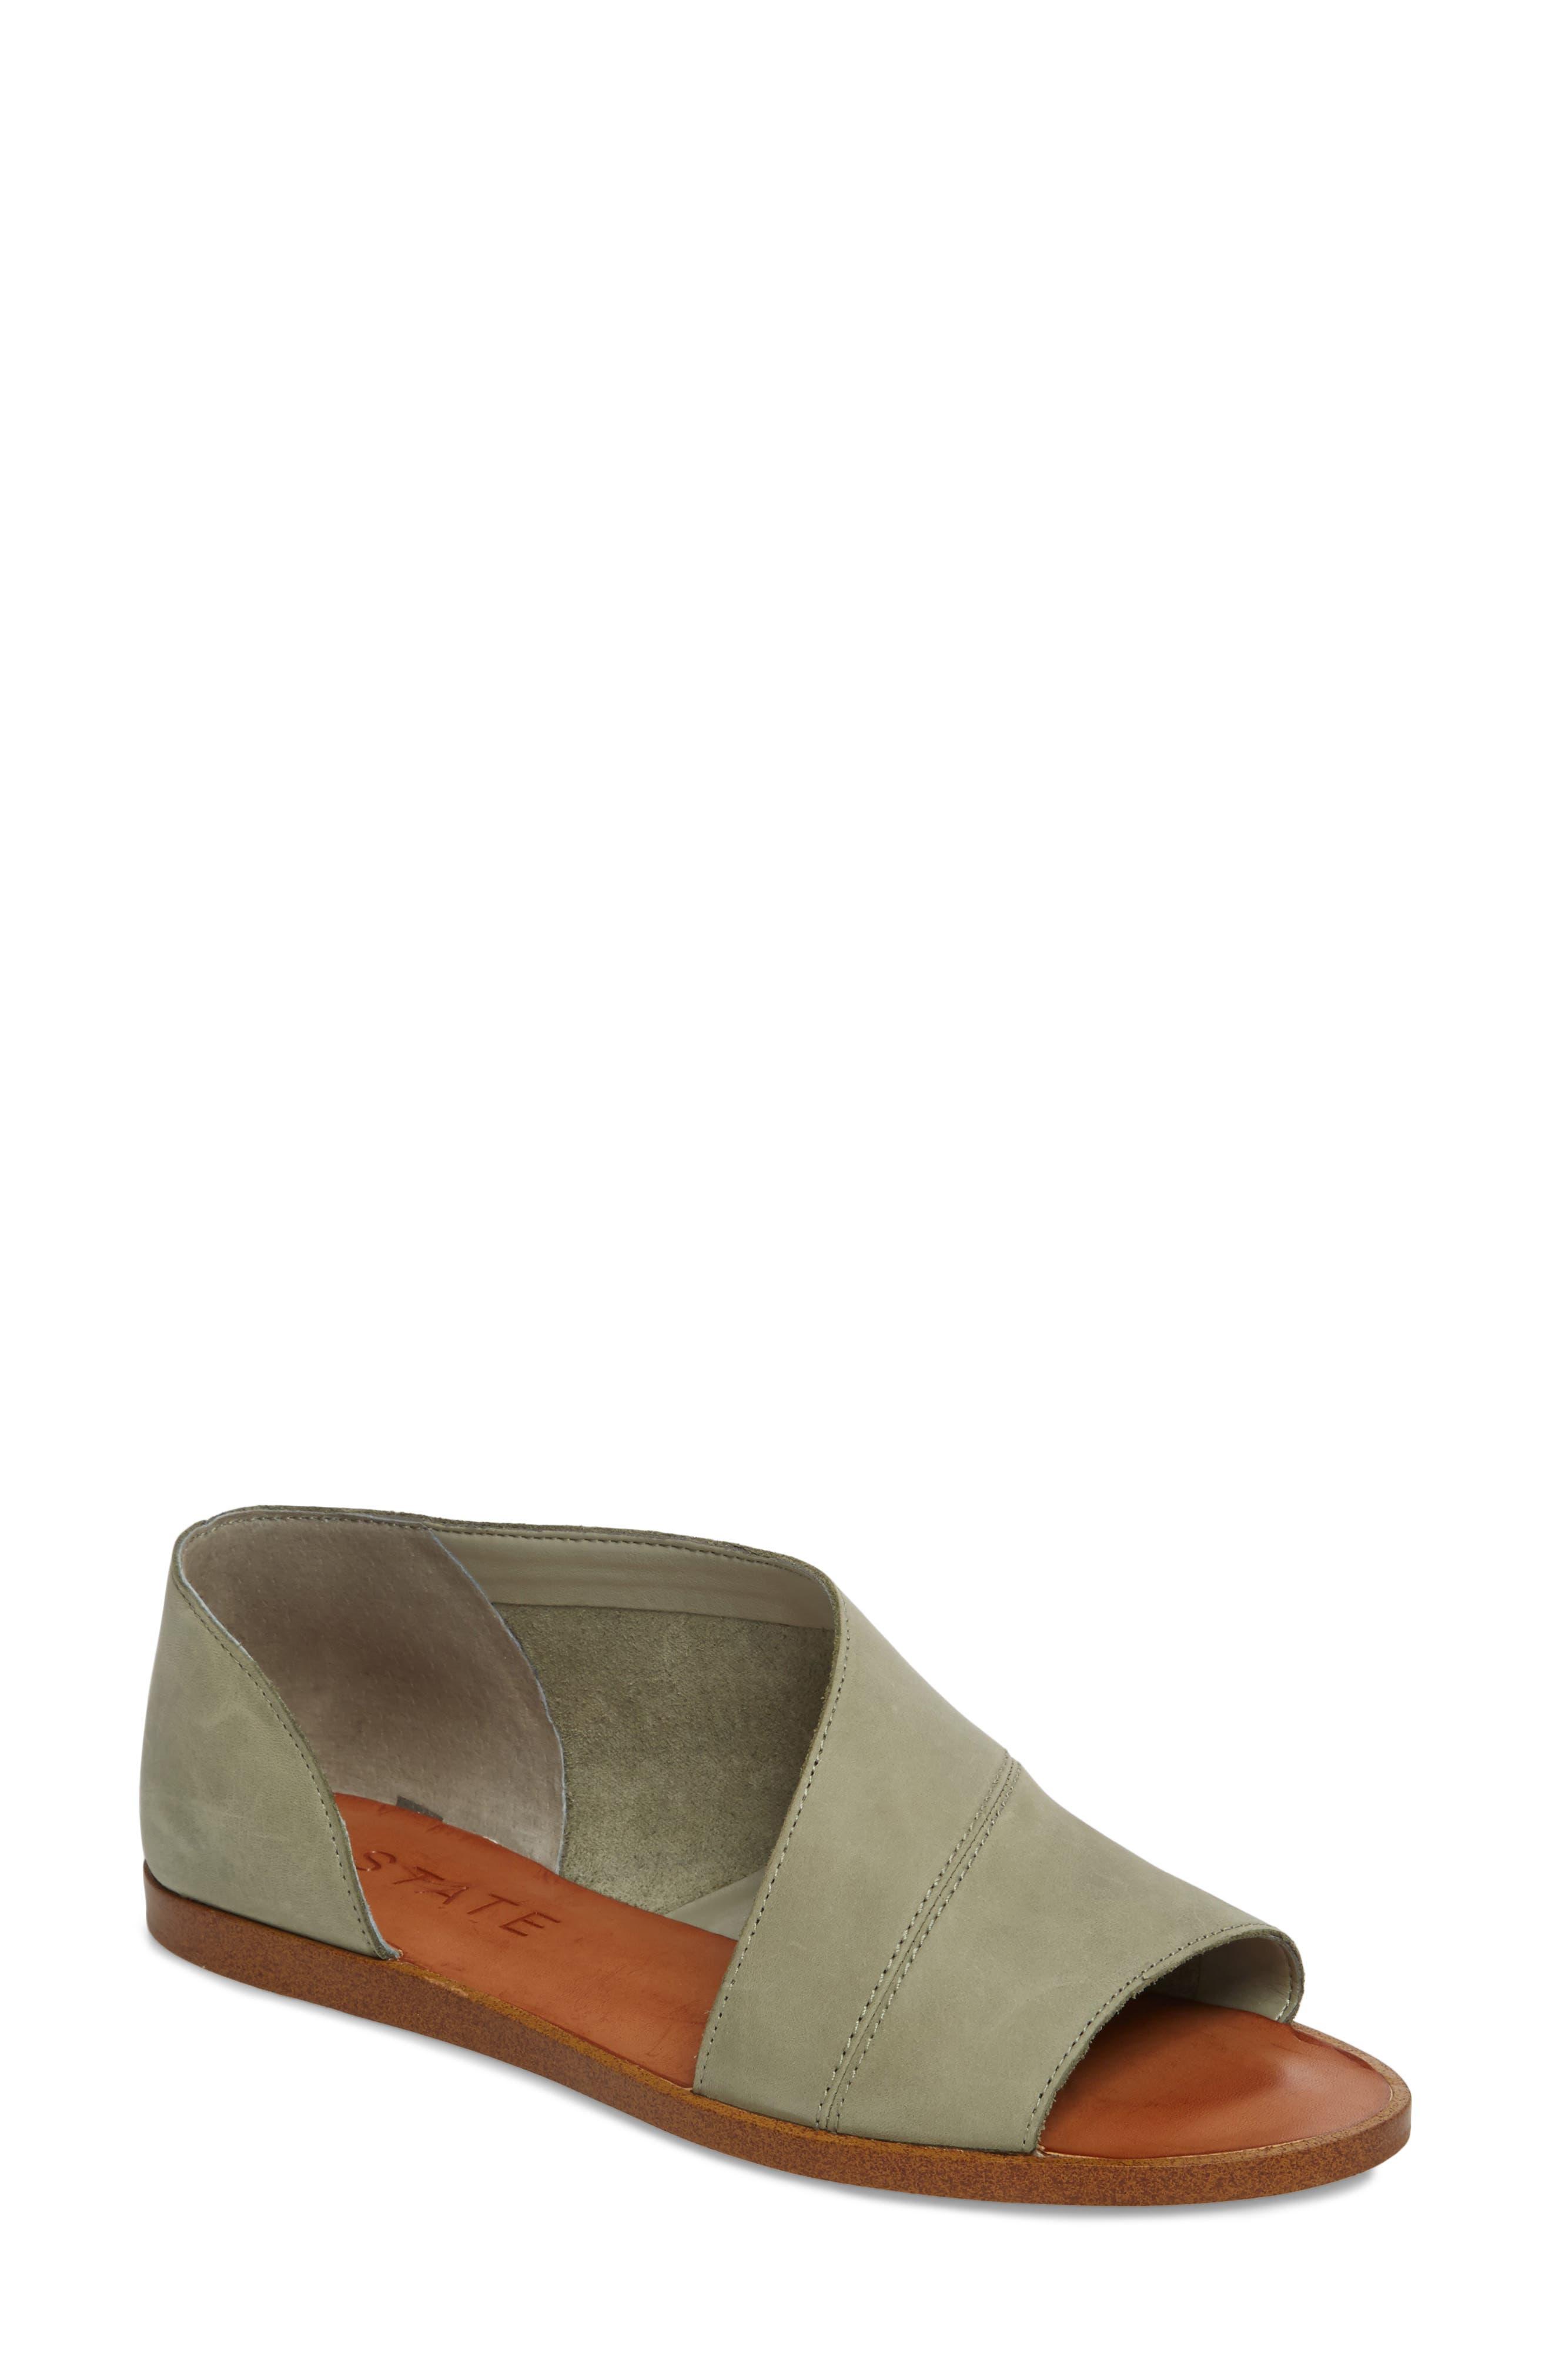 Celvin Sandal,                         Main,                         color, Nettle Leather